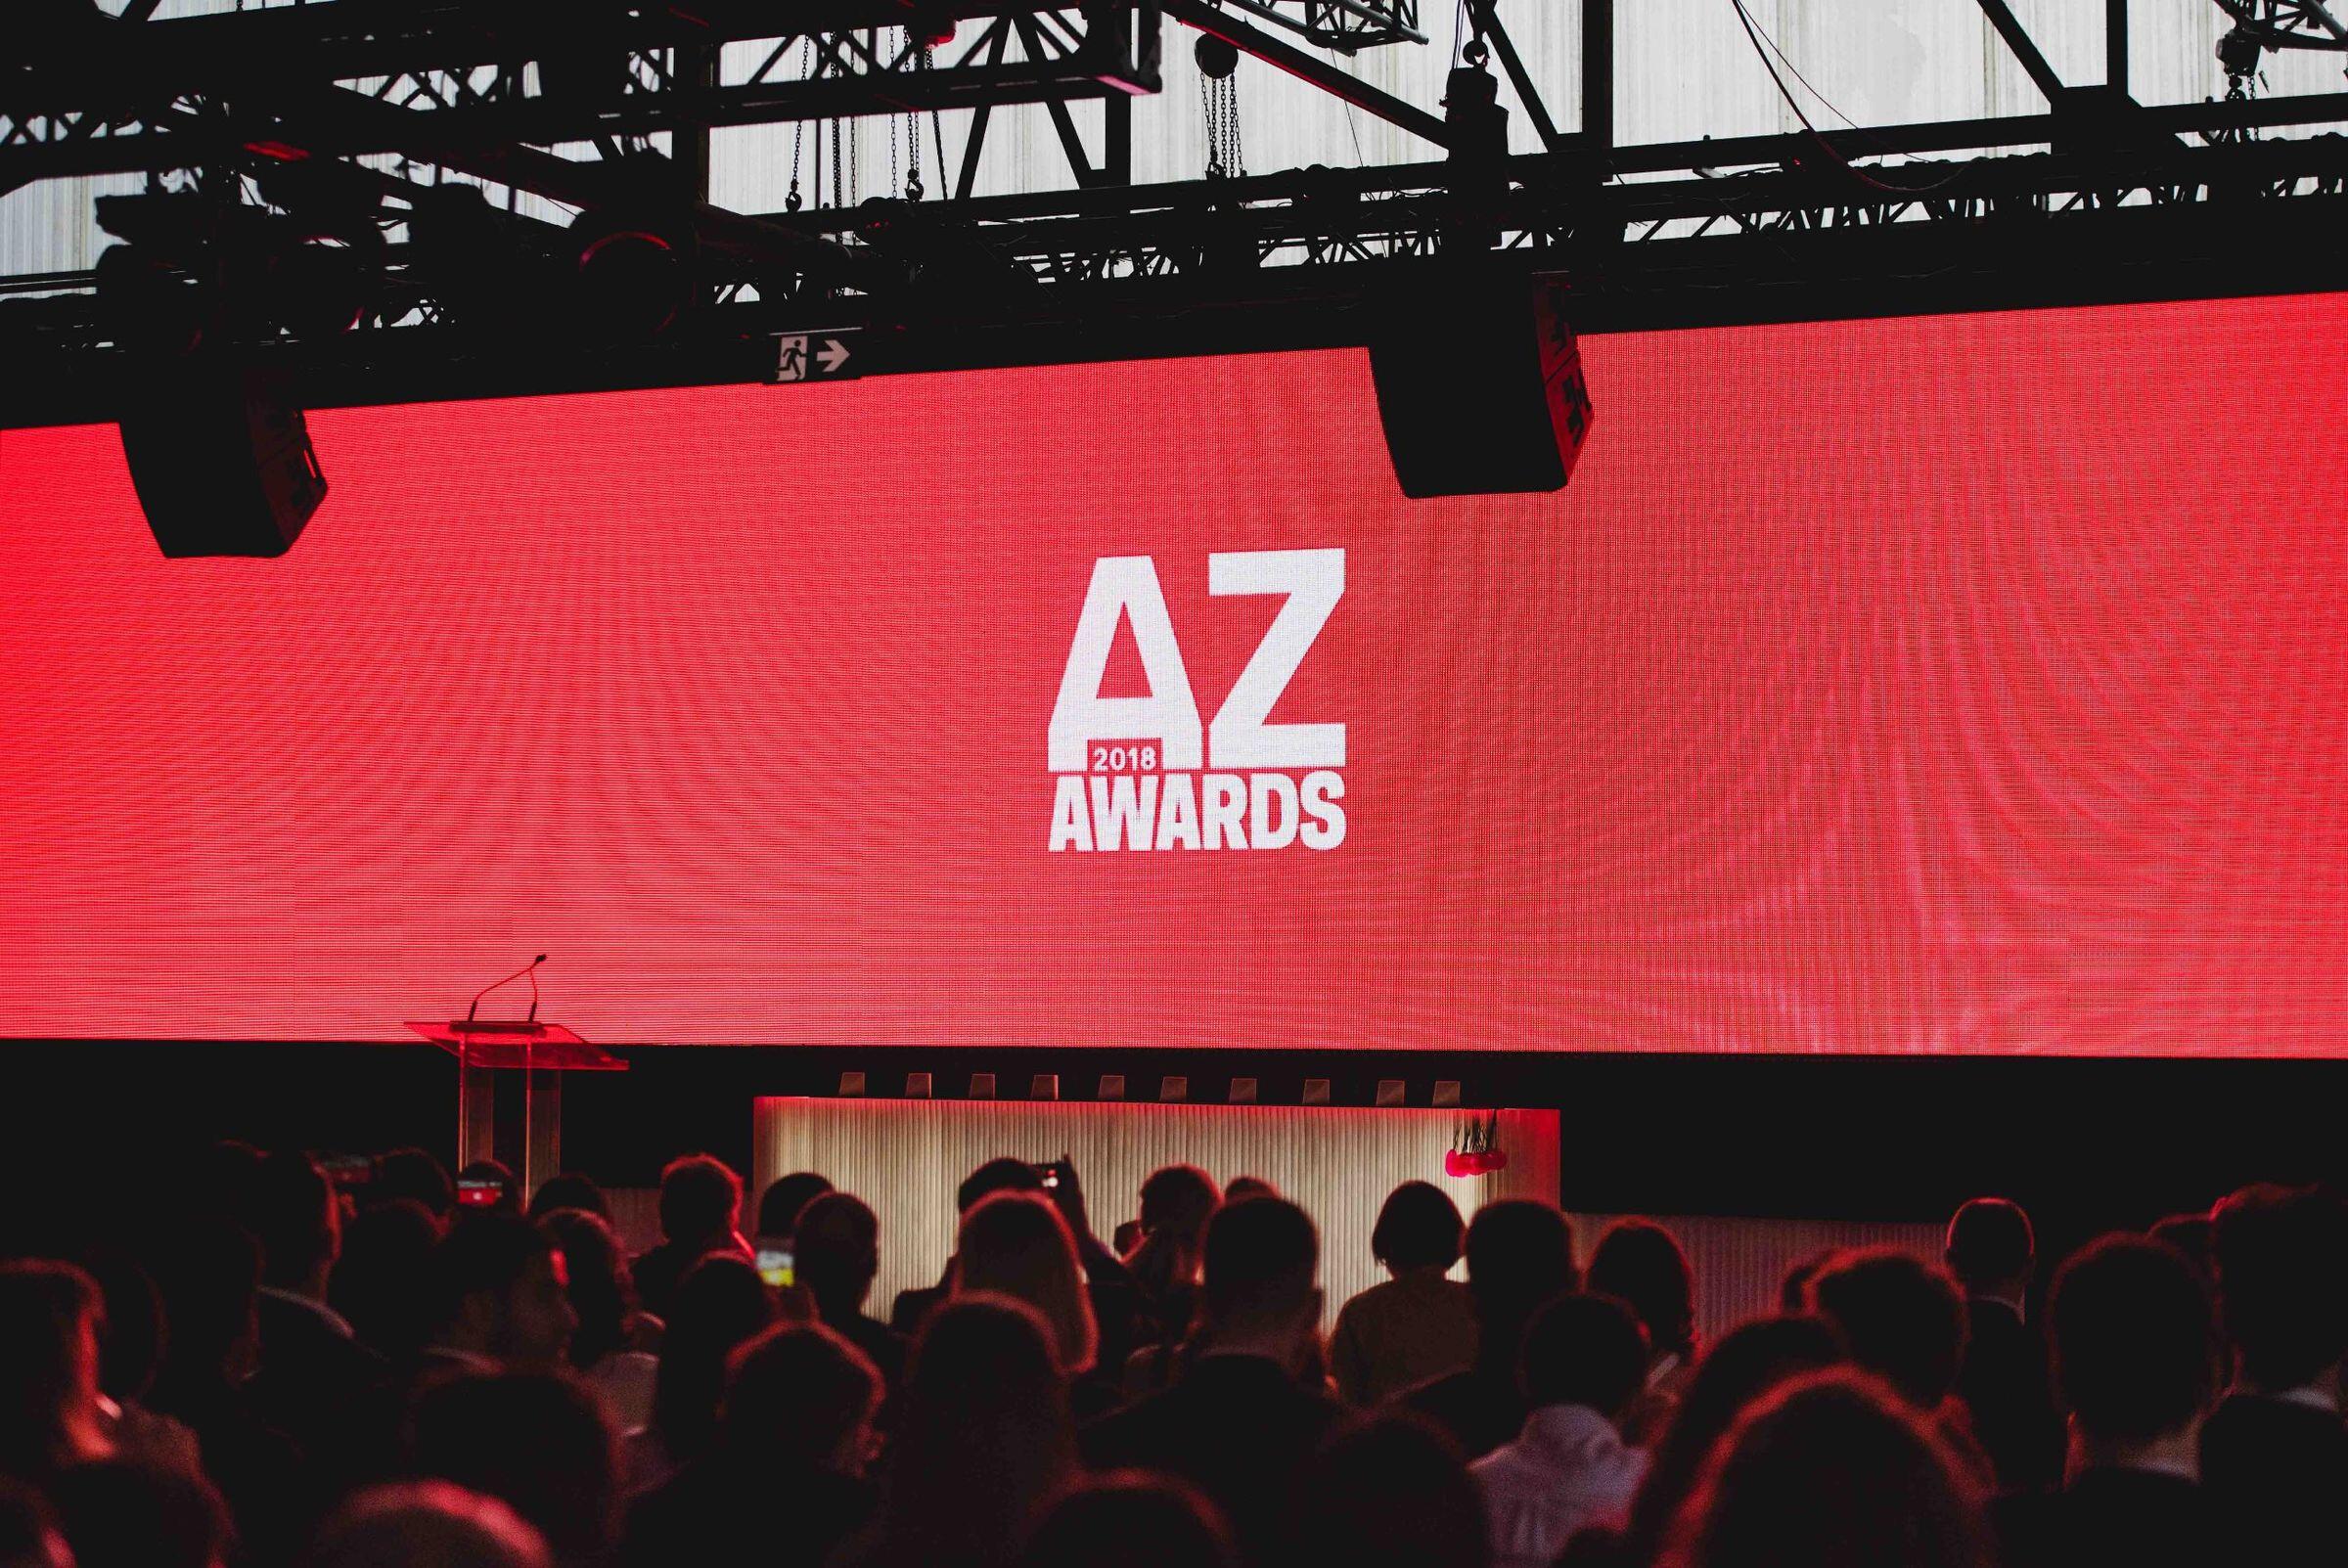 AZ Awards 2019